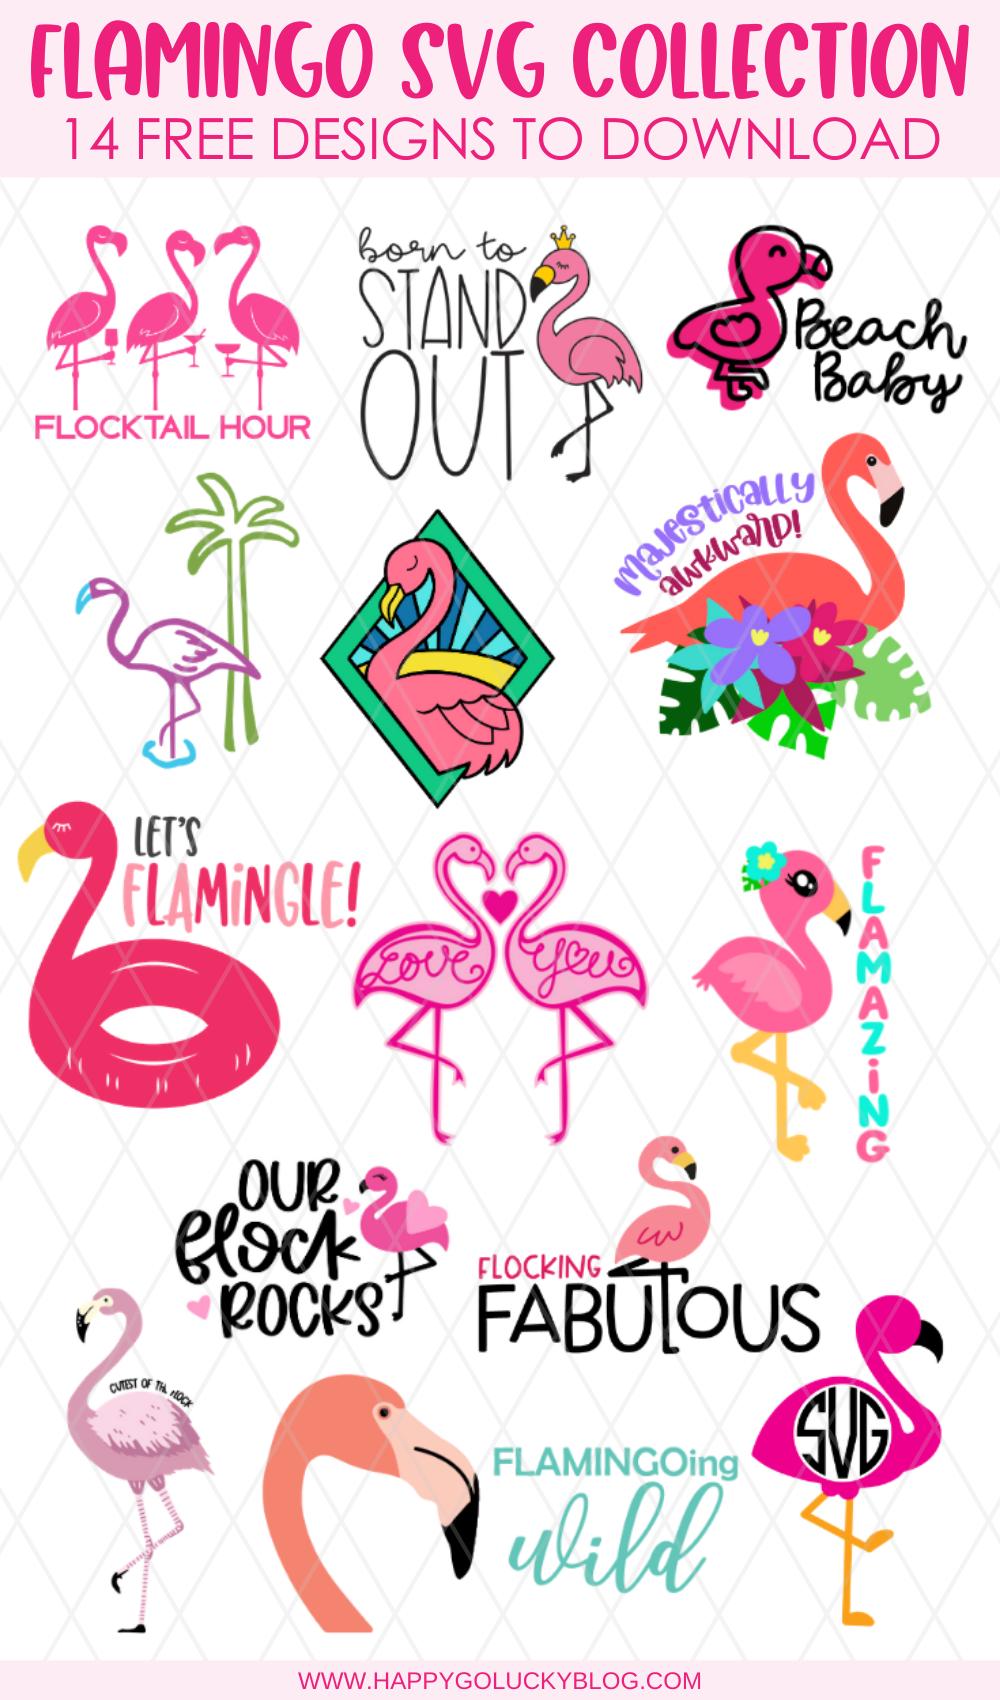 Flamingo SVG Collection